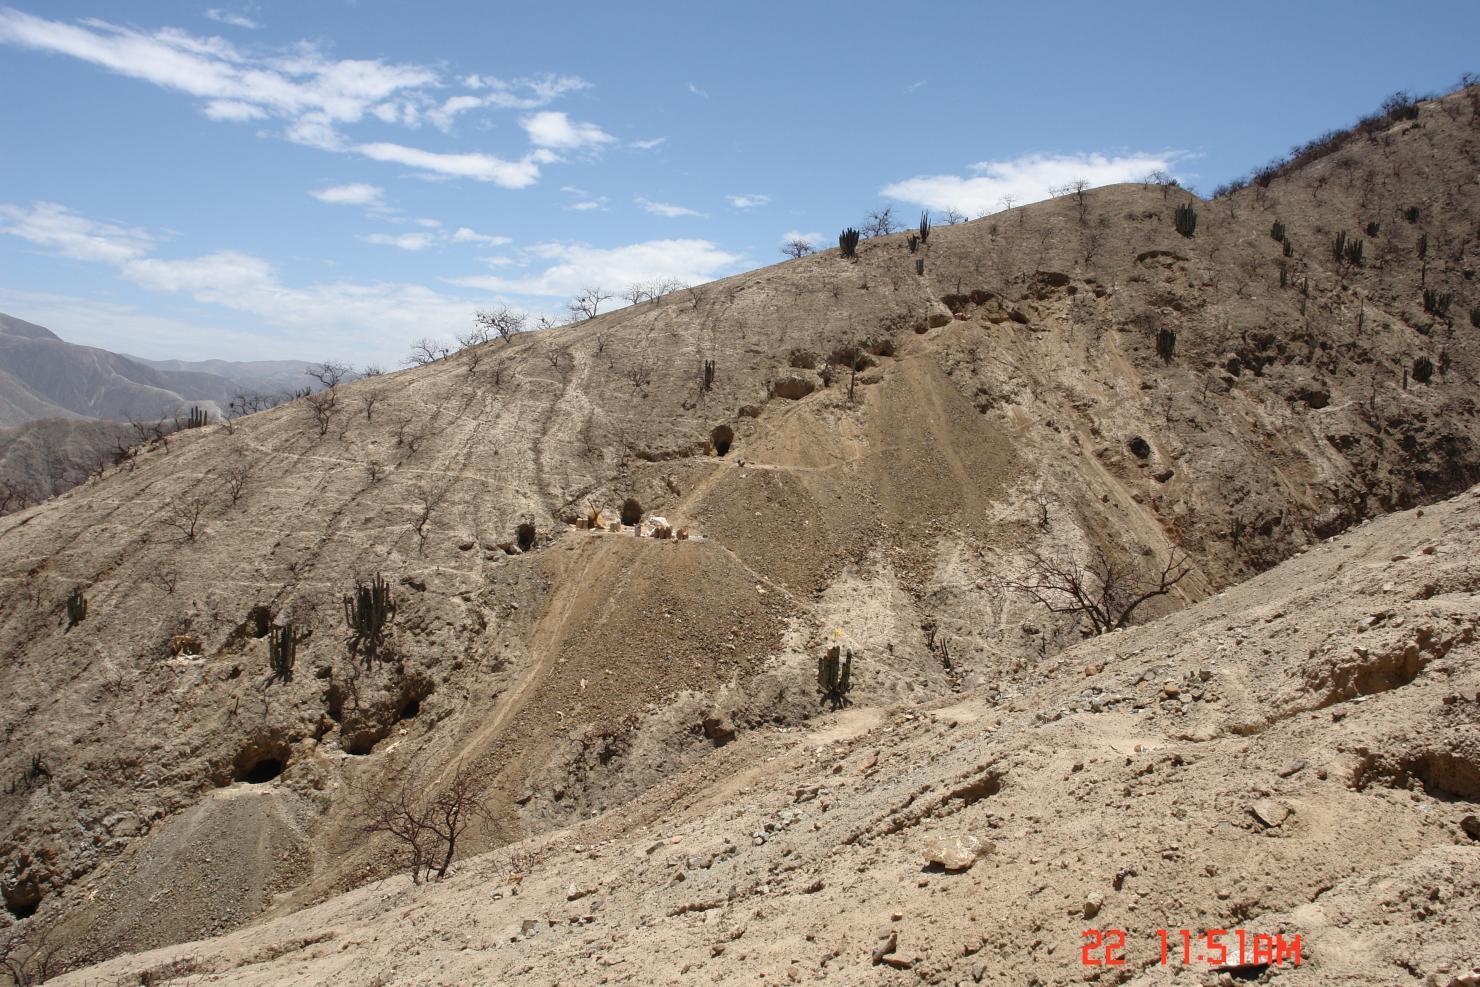 H:\Foto\Перу\Minas\15-22.02.07\YURI\DSC02488.JPG